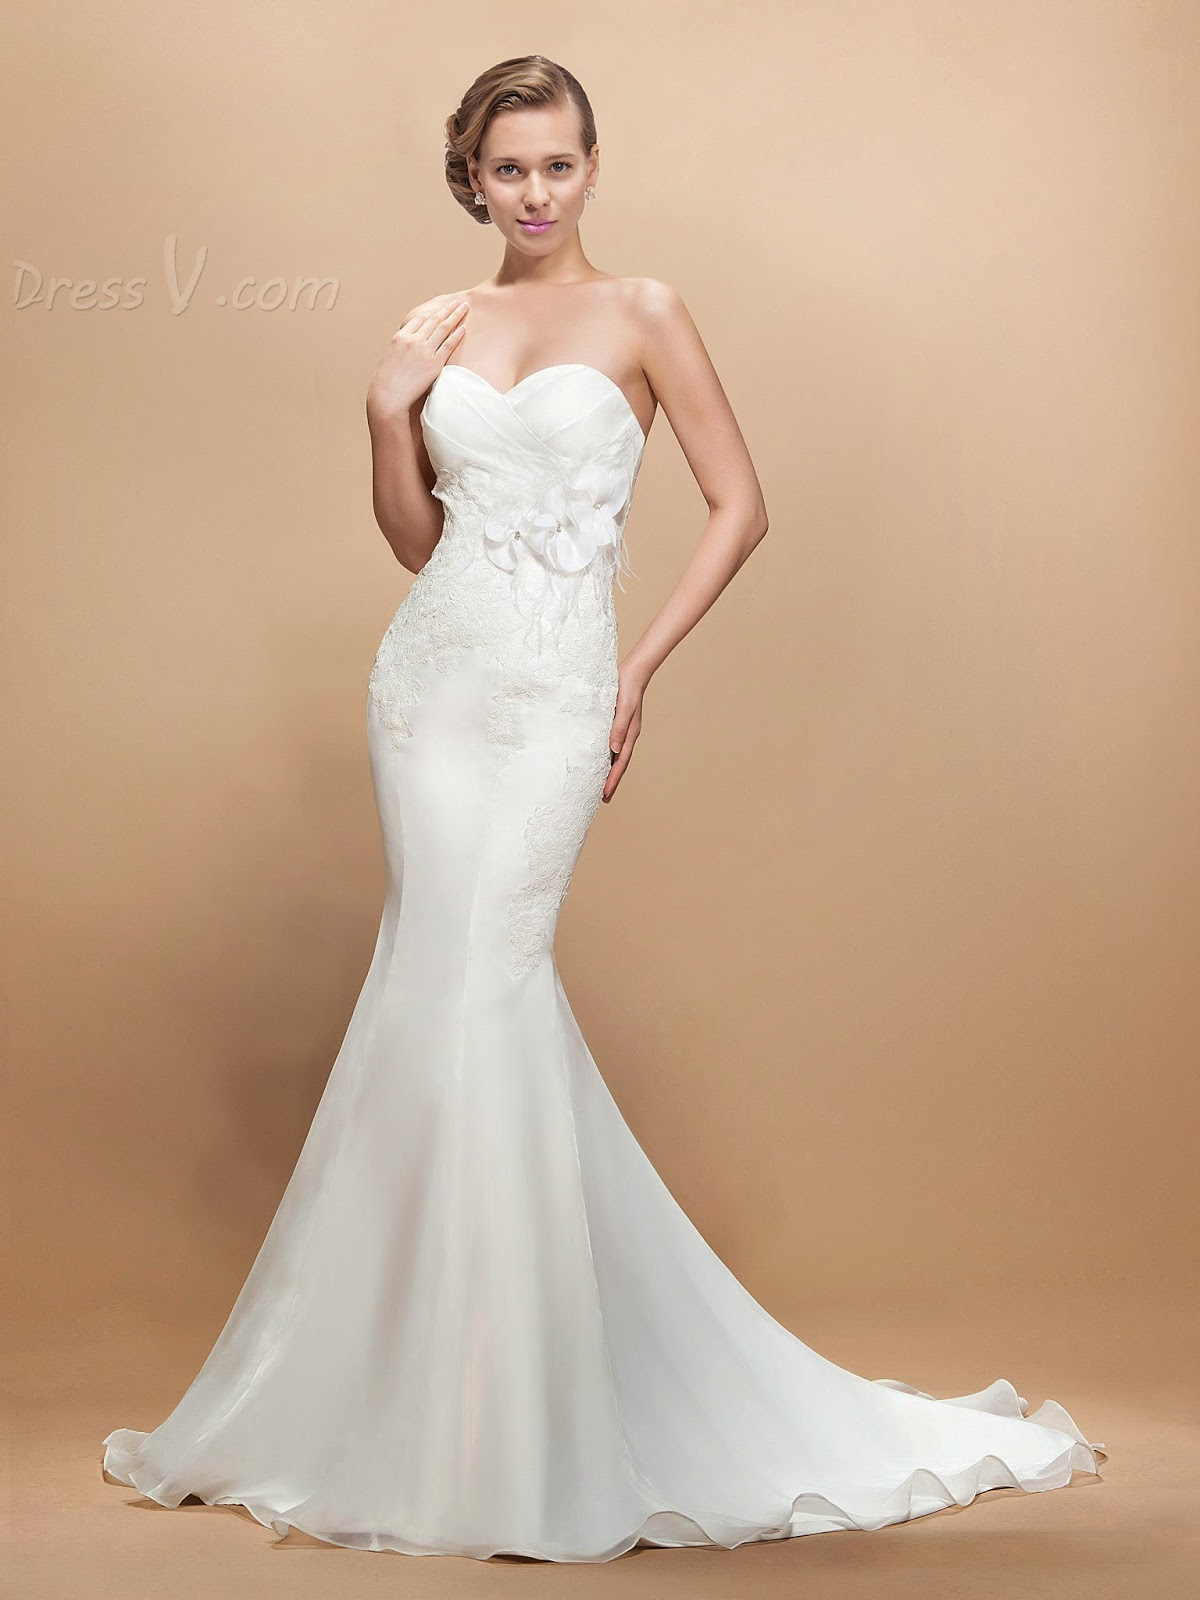 Mermaid Wedding Dresses With A Twist At Dressv